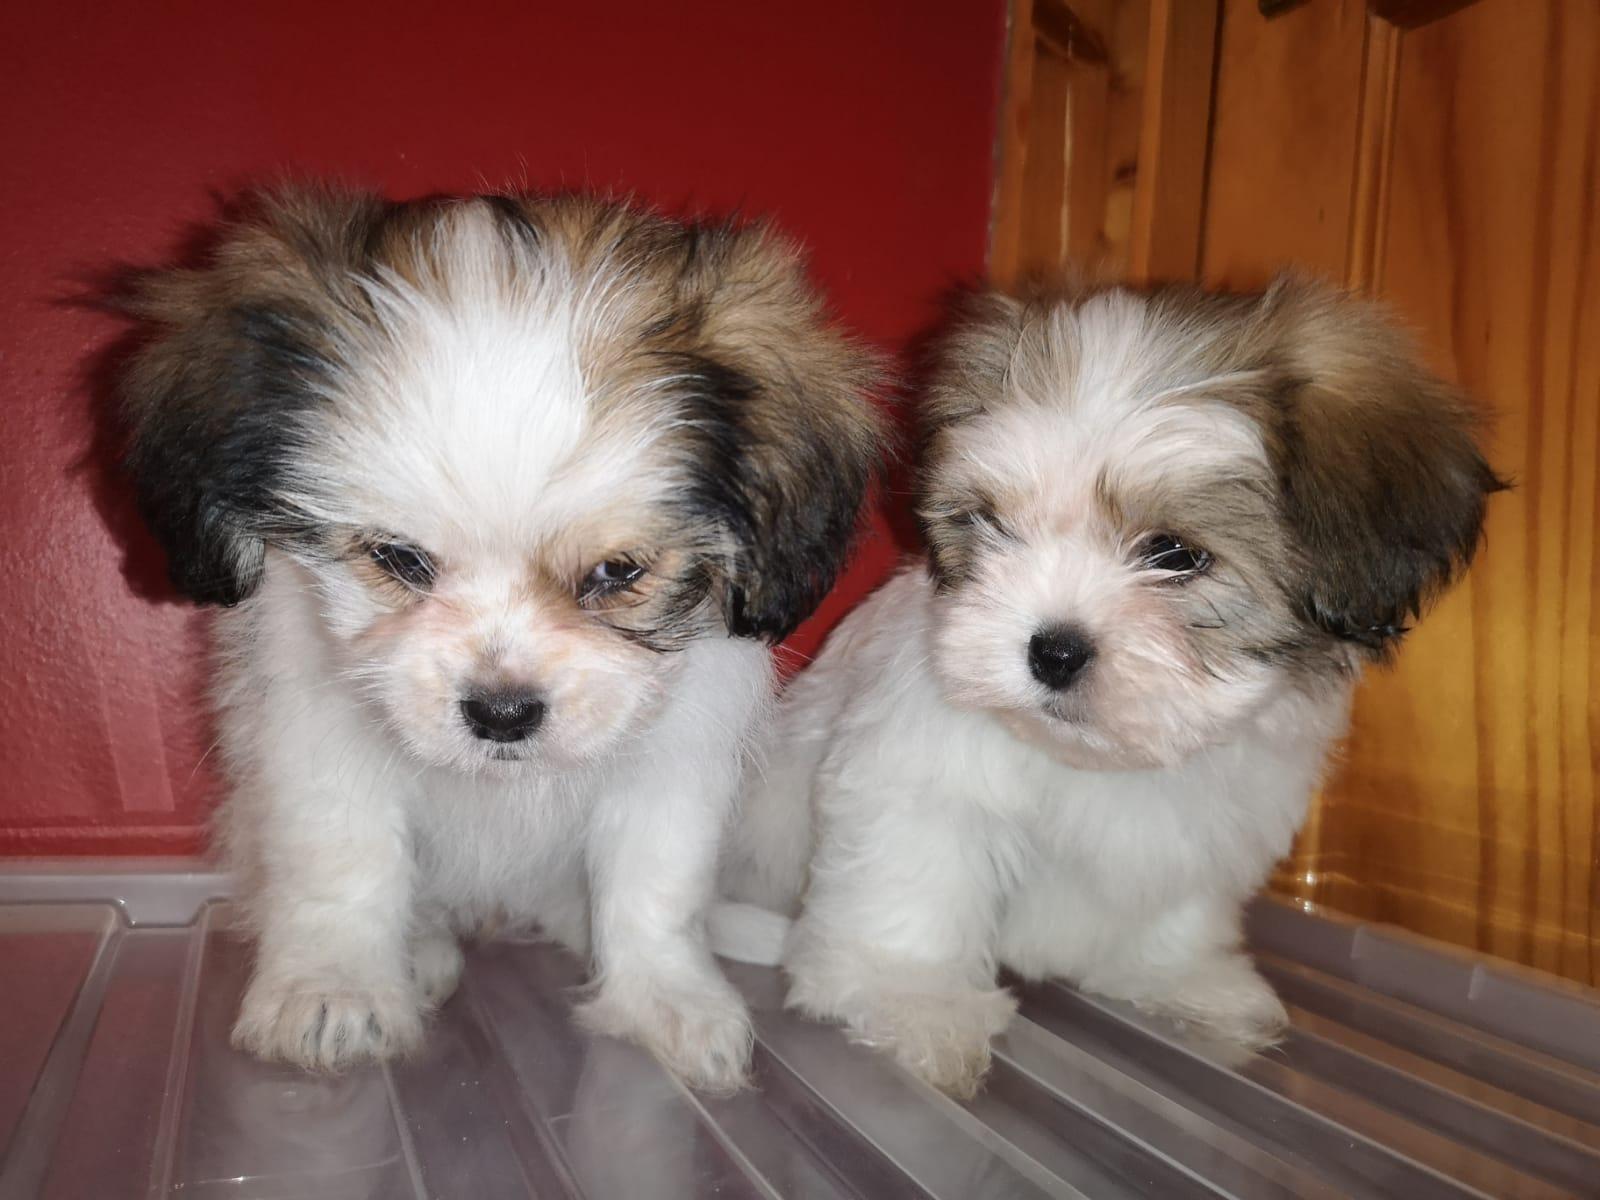 Shih Tzu Pups for Sale.  - Dogs For Sale in Coleraine